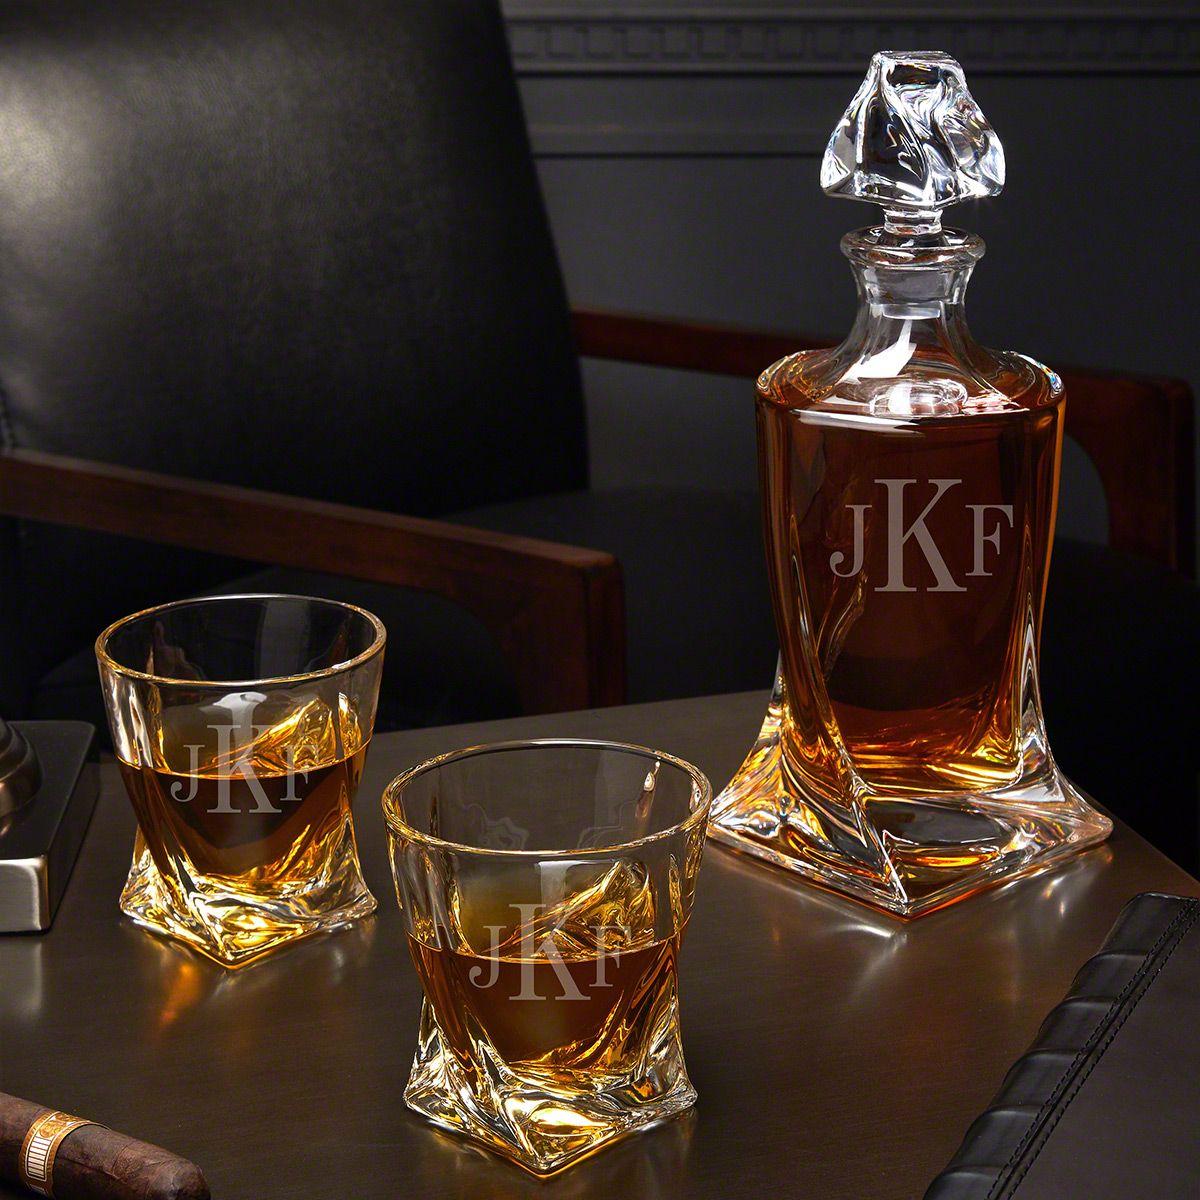 Classic Monogram Personalized Twist Whiskey Decanter Set